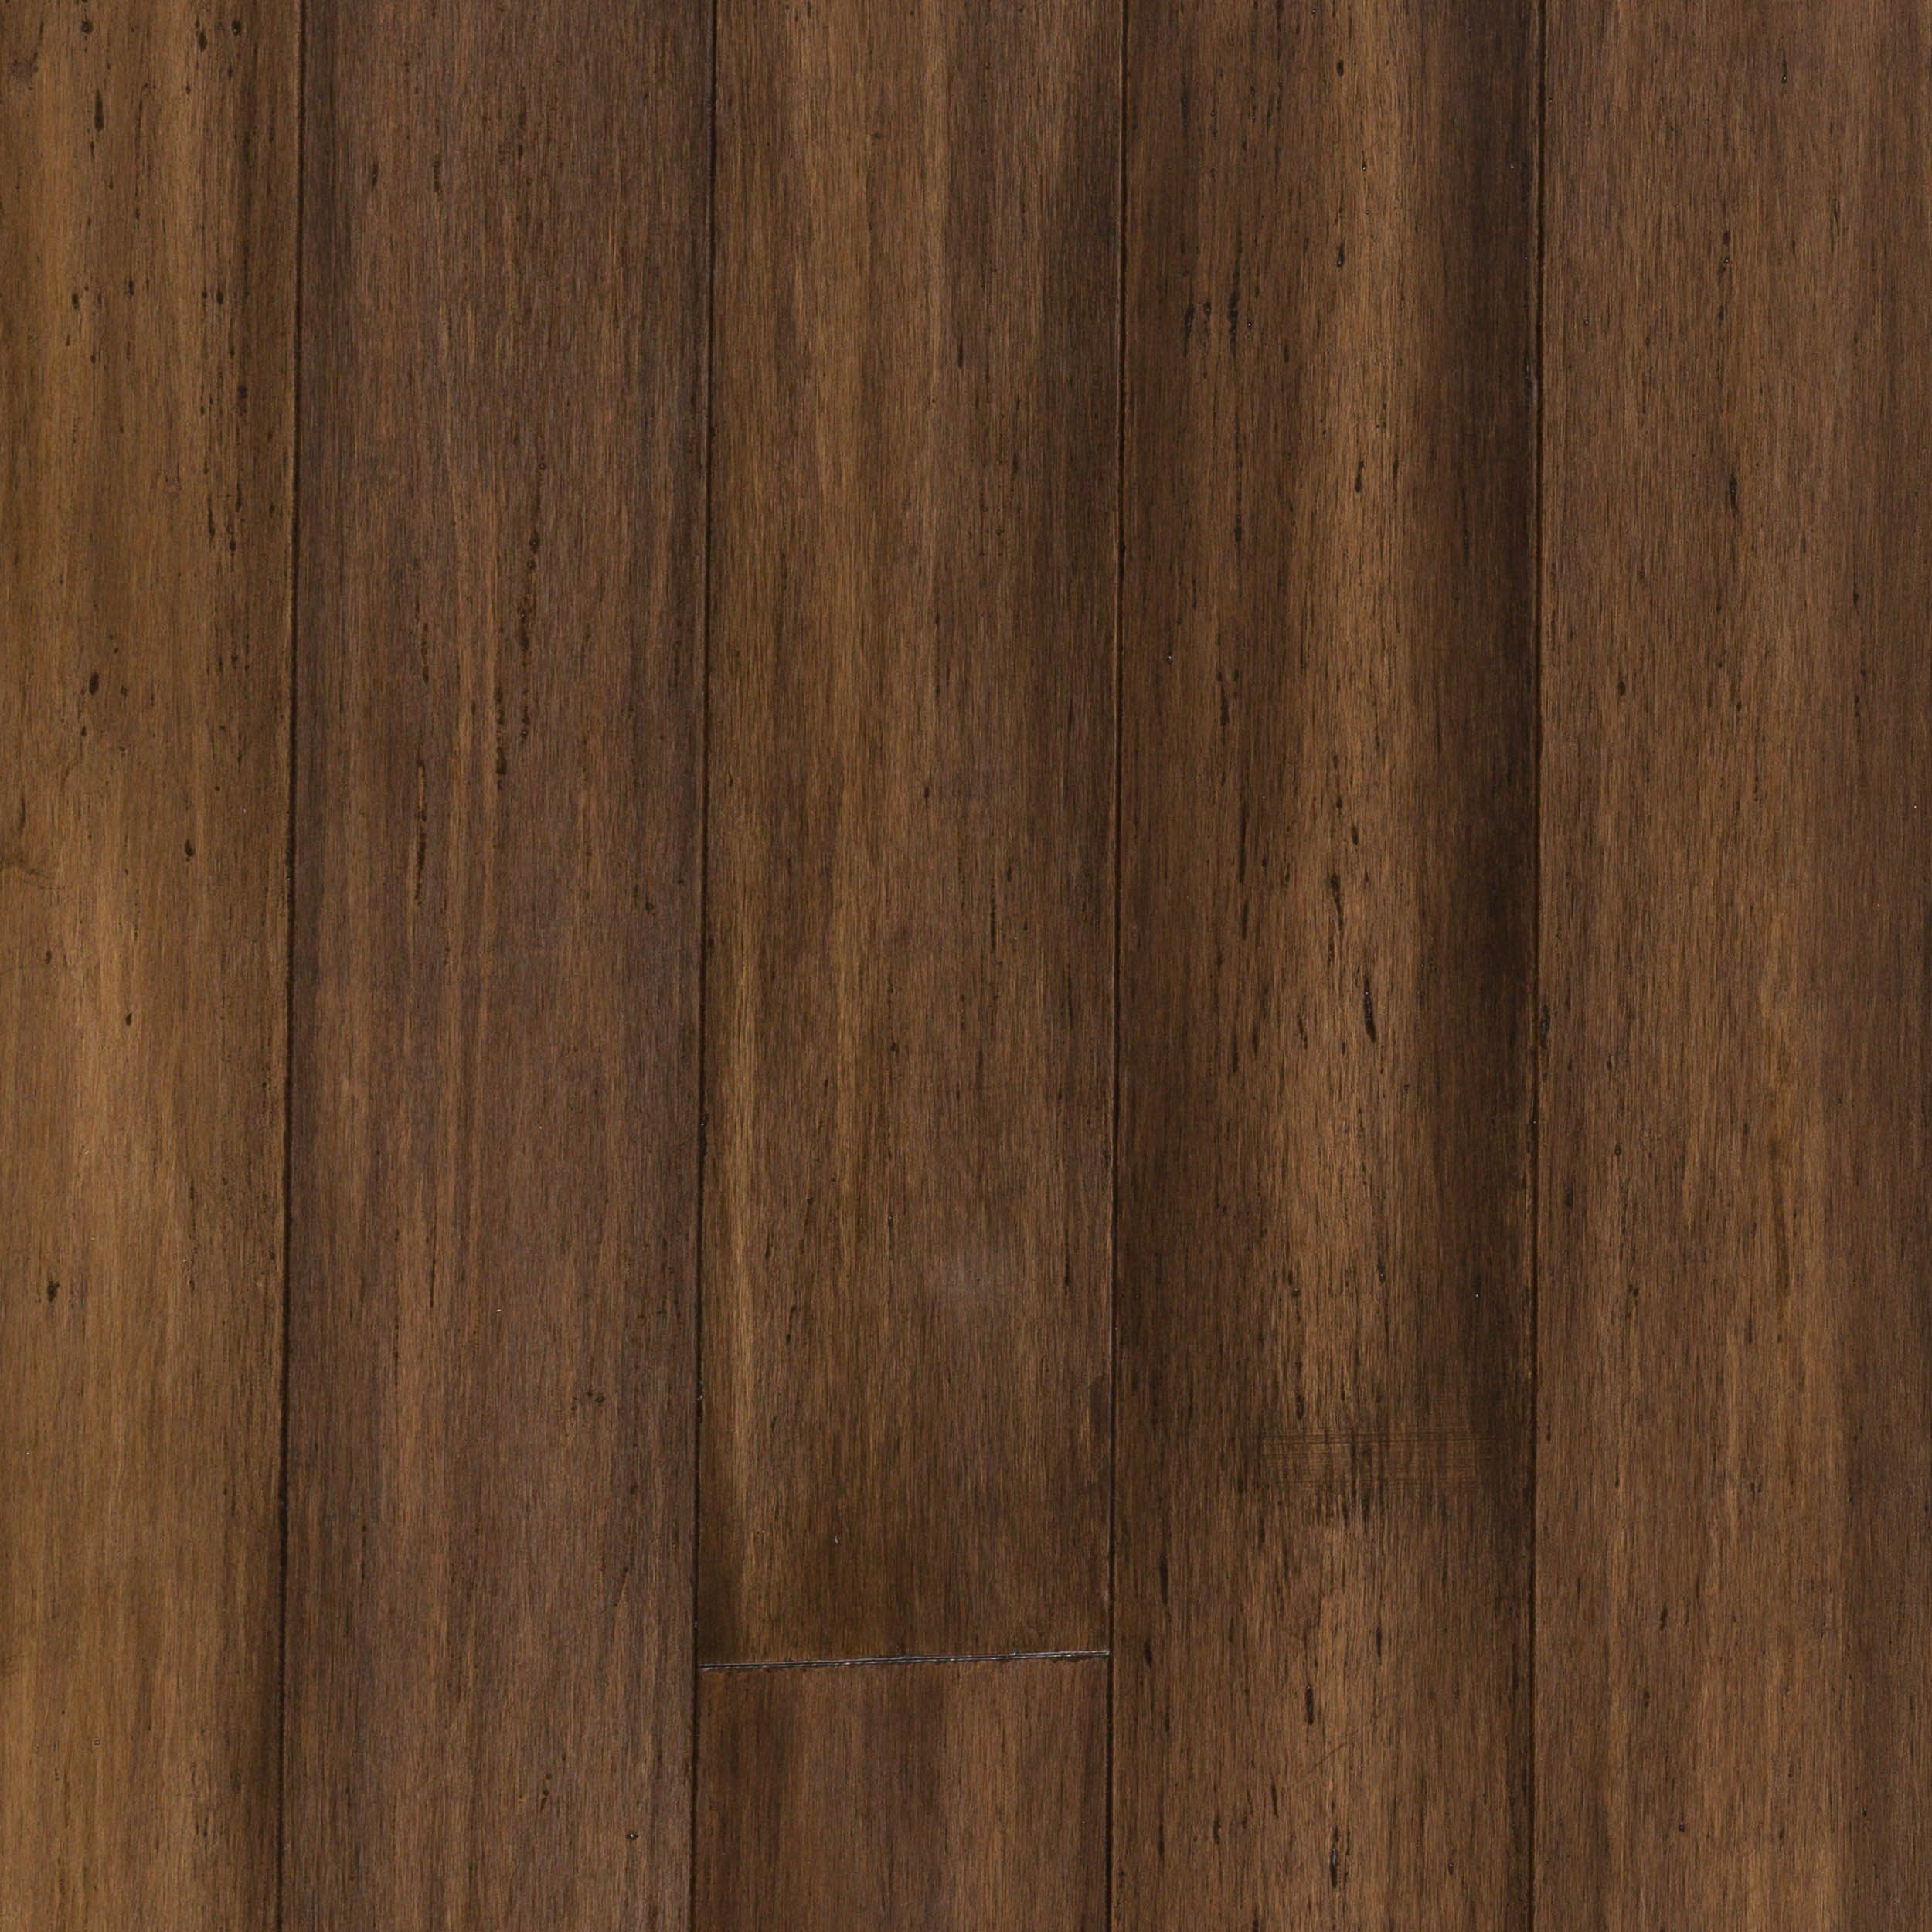 Jocelyn Hand Scraped Engineered Stranded Bamboo Eco Friendly Flooring Bamboo Flooring Bamboo